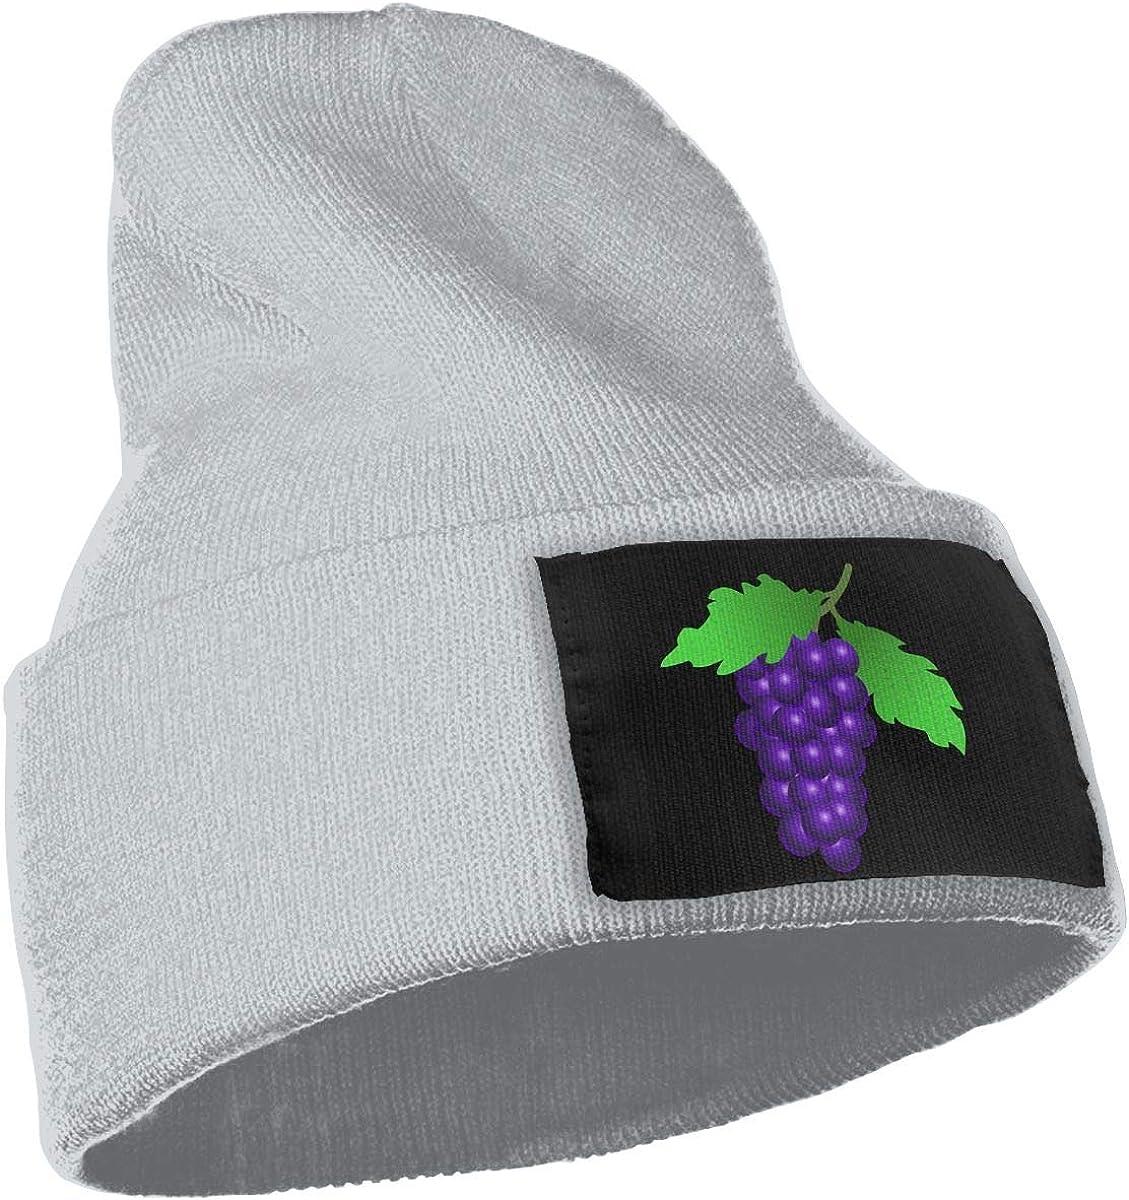 The Grapes Fashion Ski Cap WHOO93@Y Unisex 100/% Acrylic Knitting Hat Cap